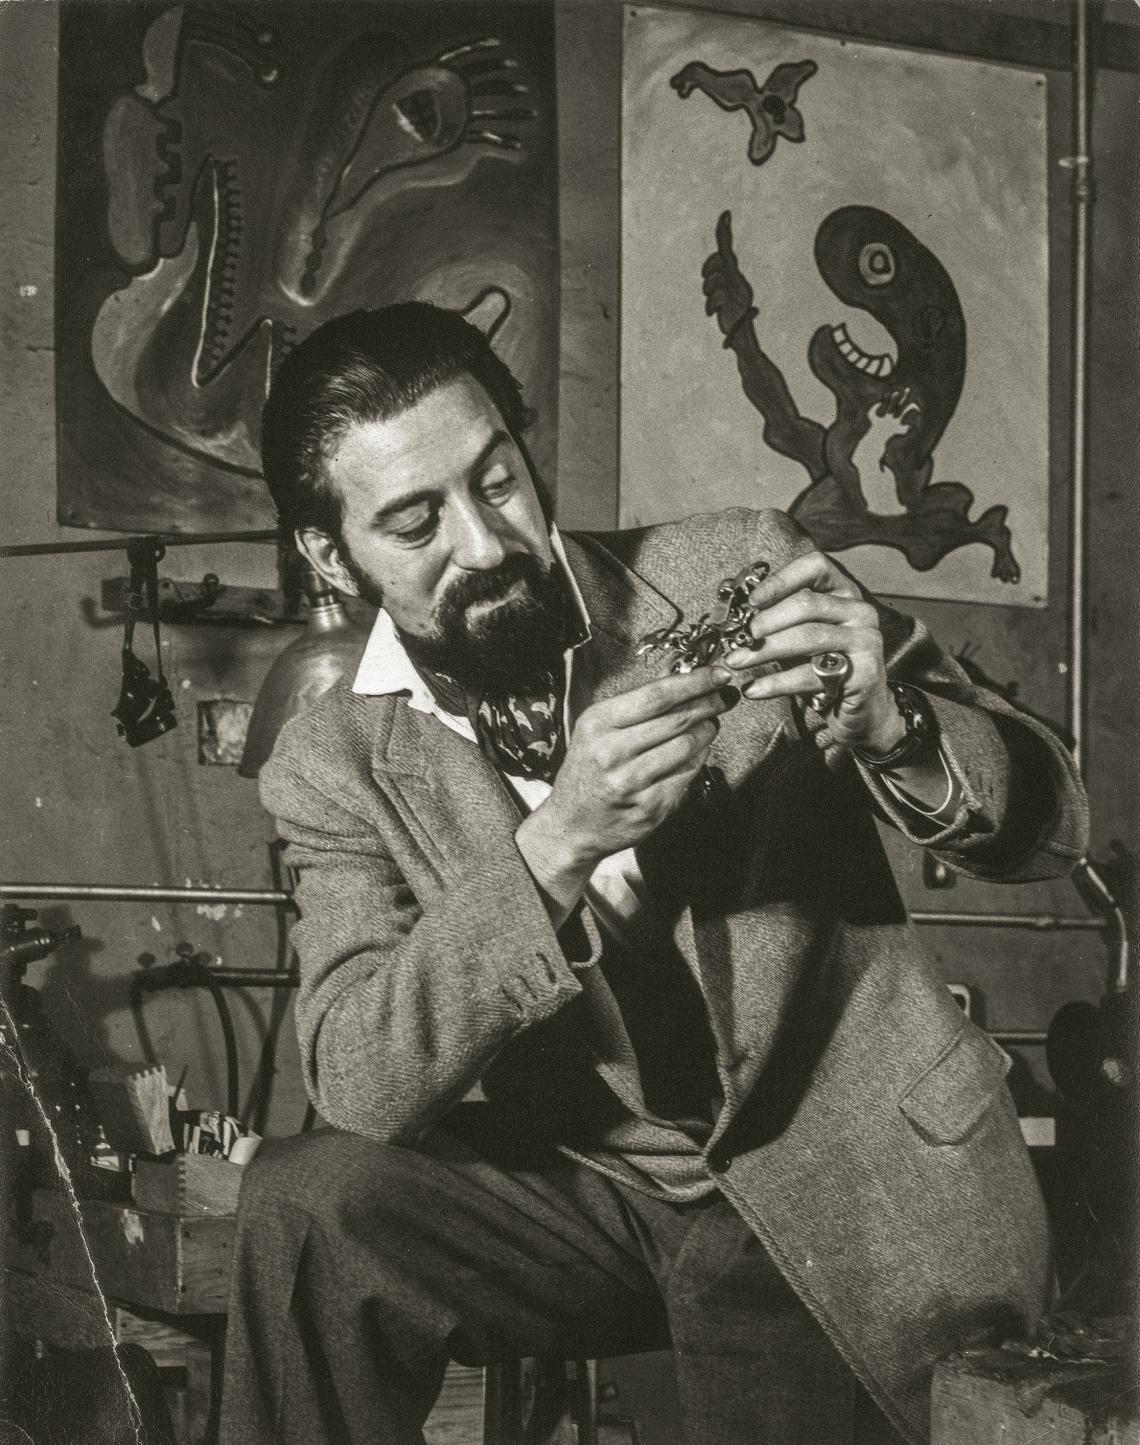 Saul Dash, Sam Kramer, 1940-1949. Courtesy John (Chico) Kramer and Carol Jane Kramer©